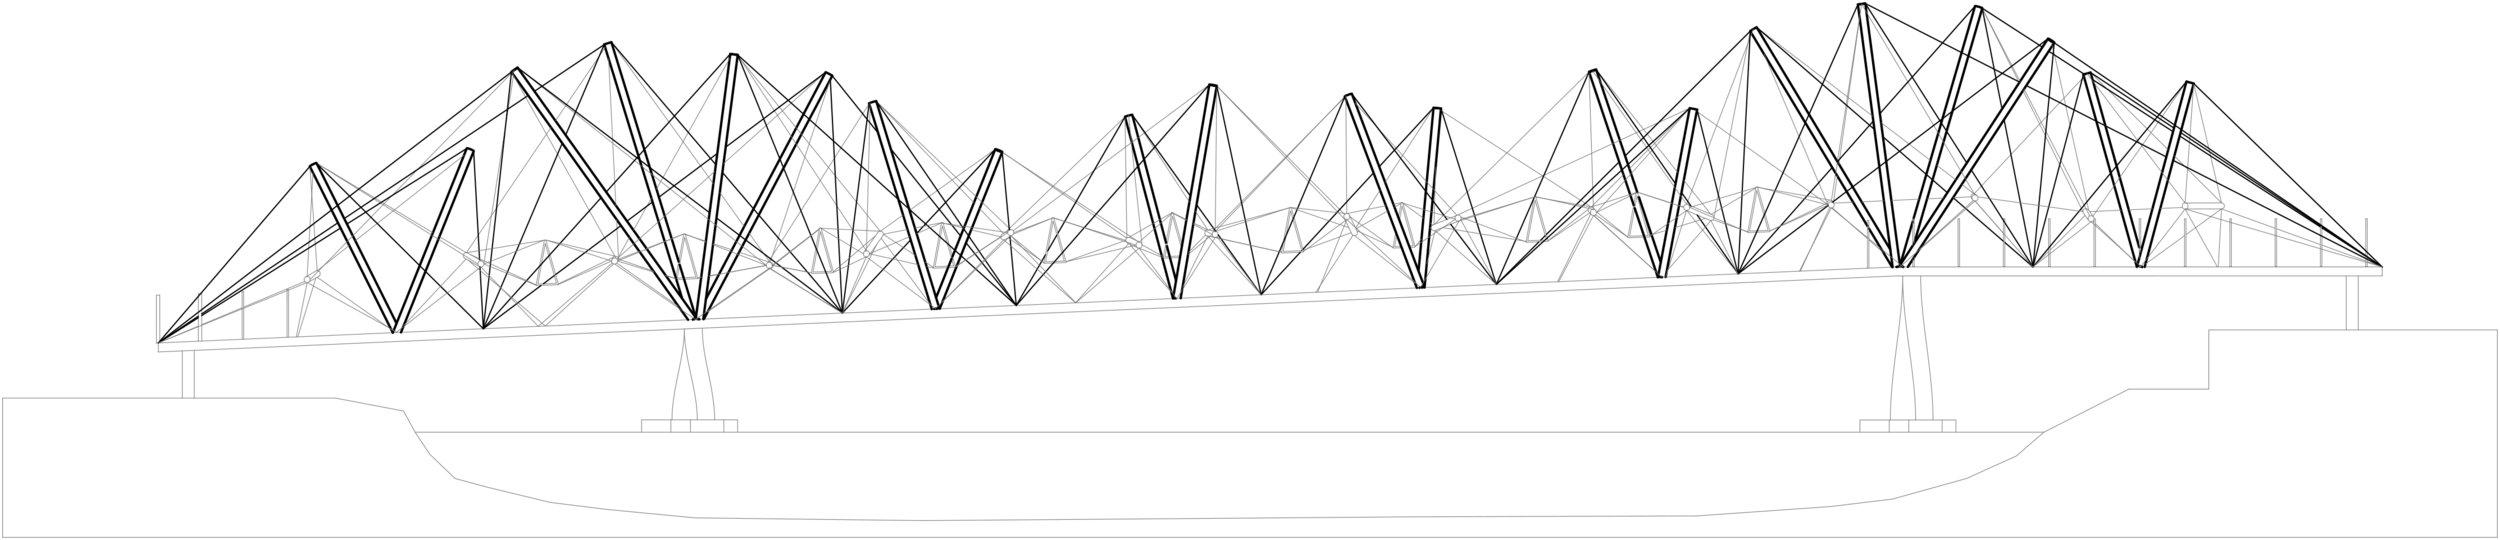 masts elevation.jpg